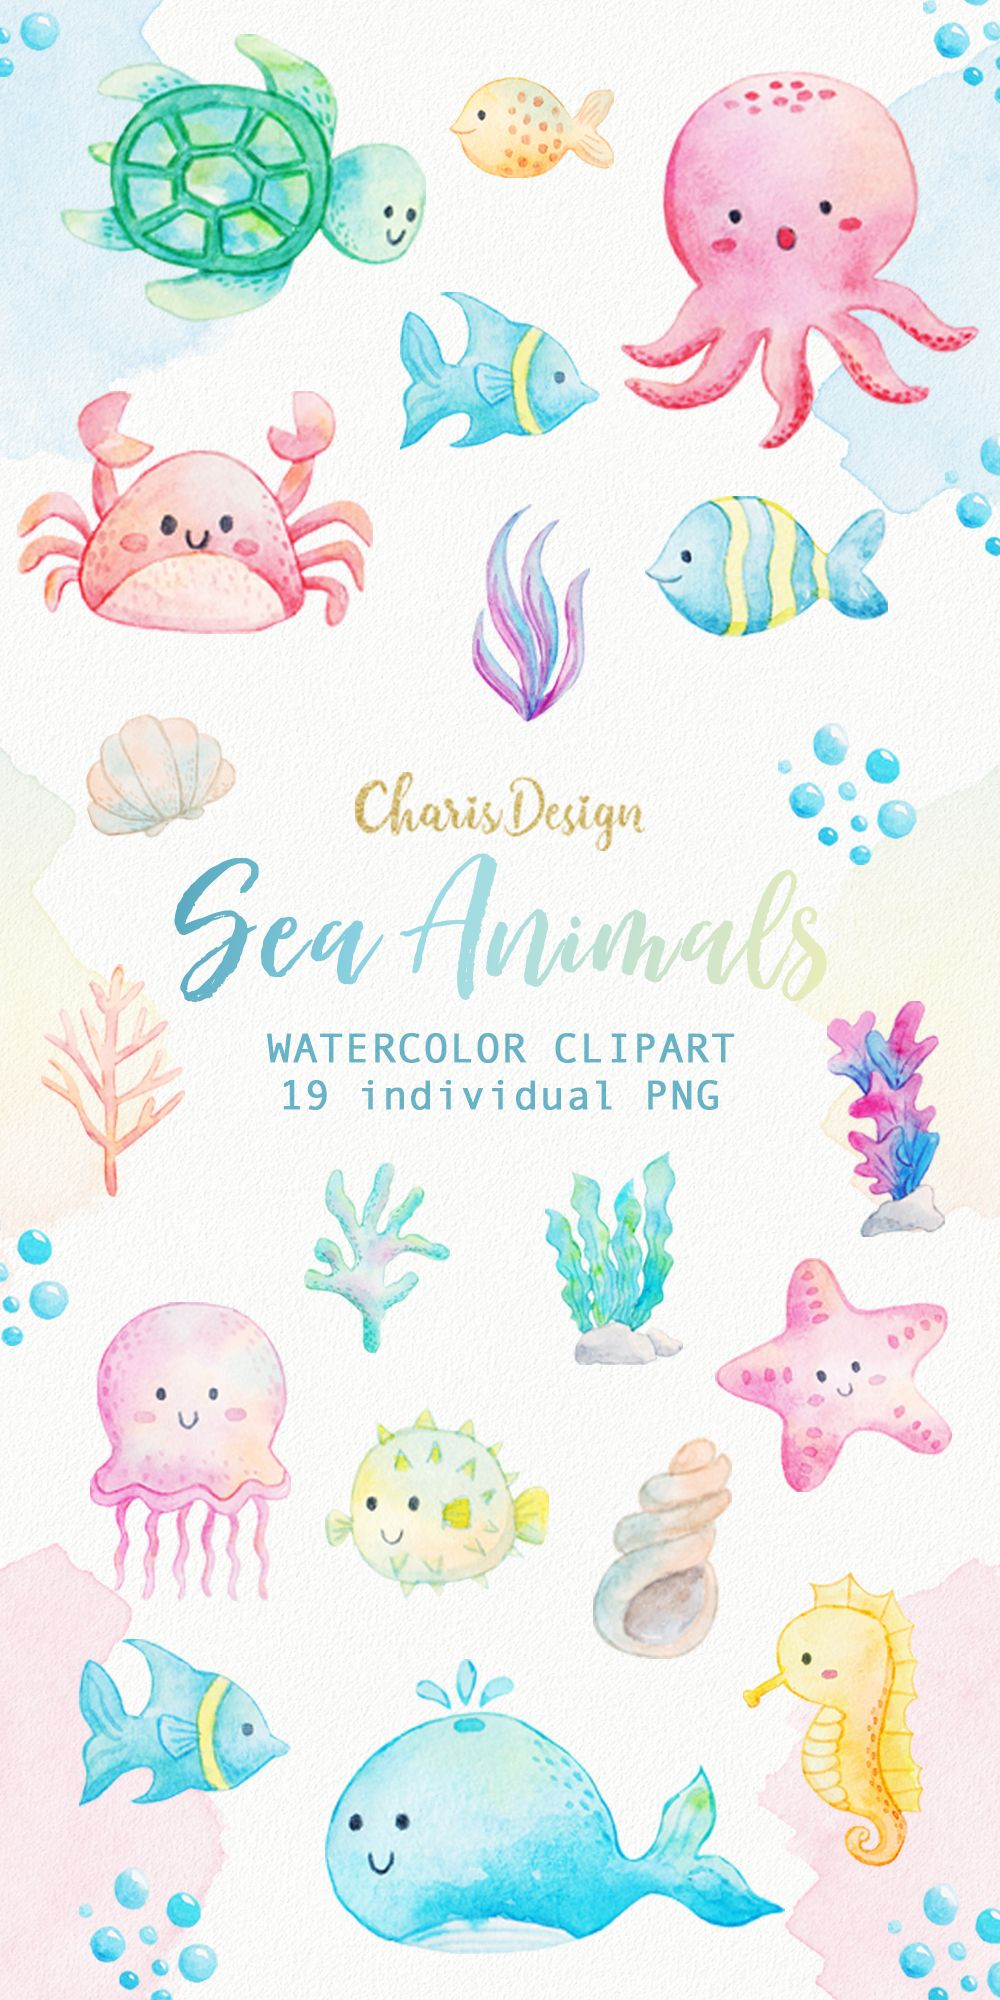 Sea Animals Watercolor Clipart Ocean Seaweed Underwater Fishes